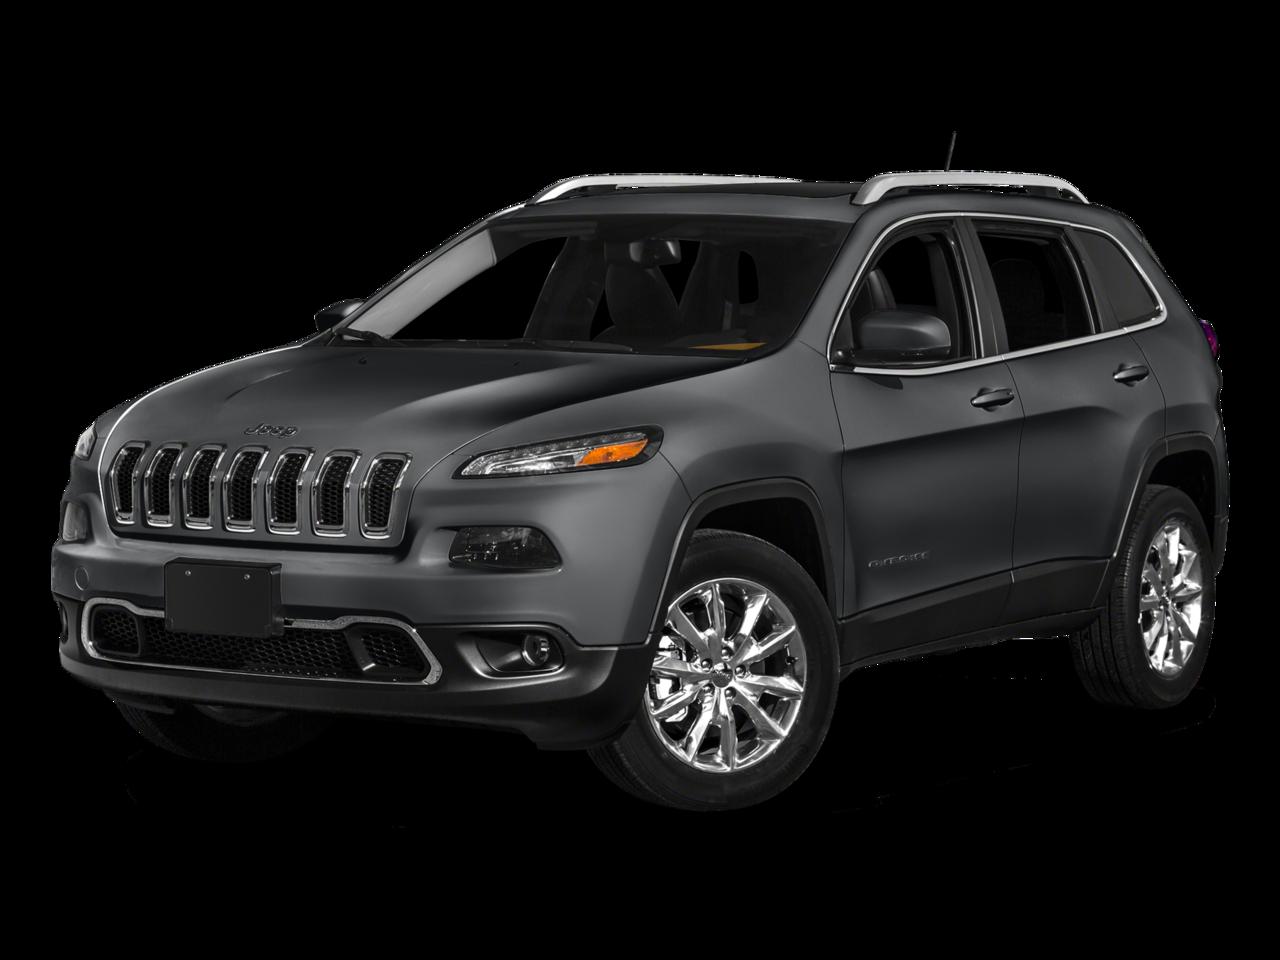 2017 jeep cherokee keene nh keene chrysler dodge jeep ram. Black Bedroom Furniture Sets. Home Design Ideas